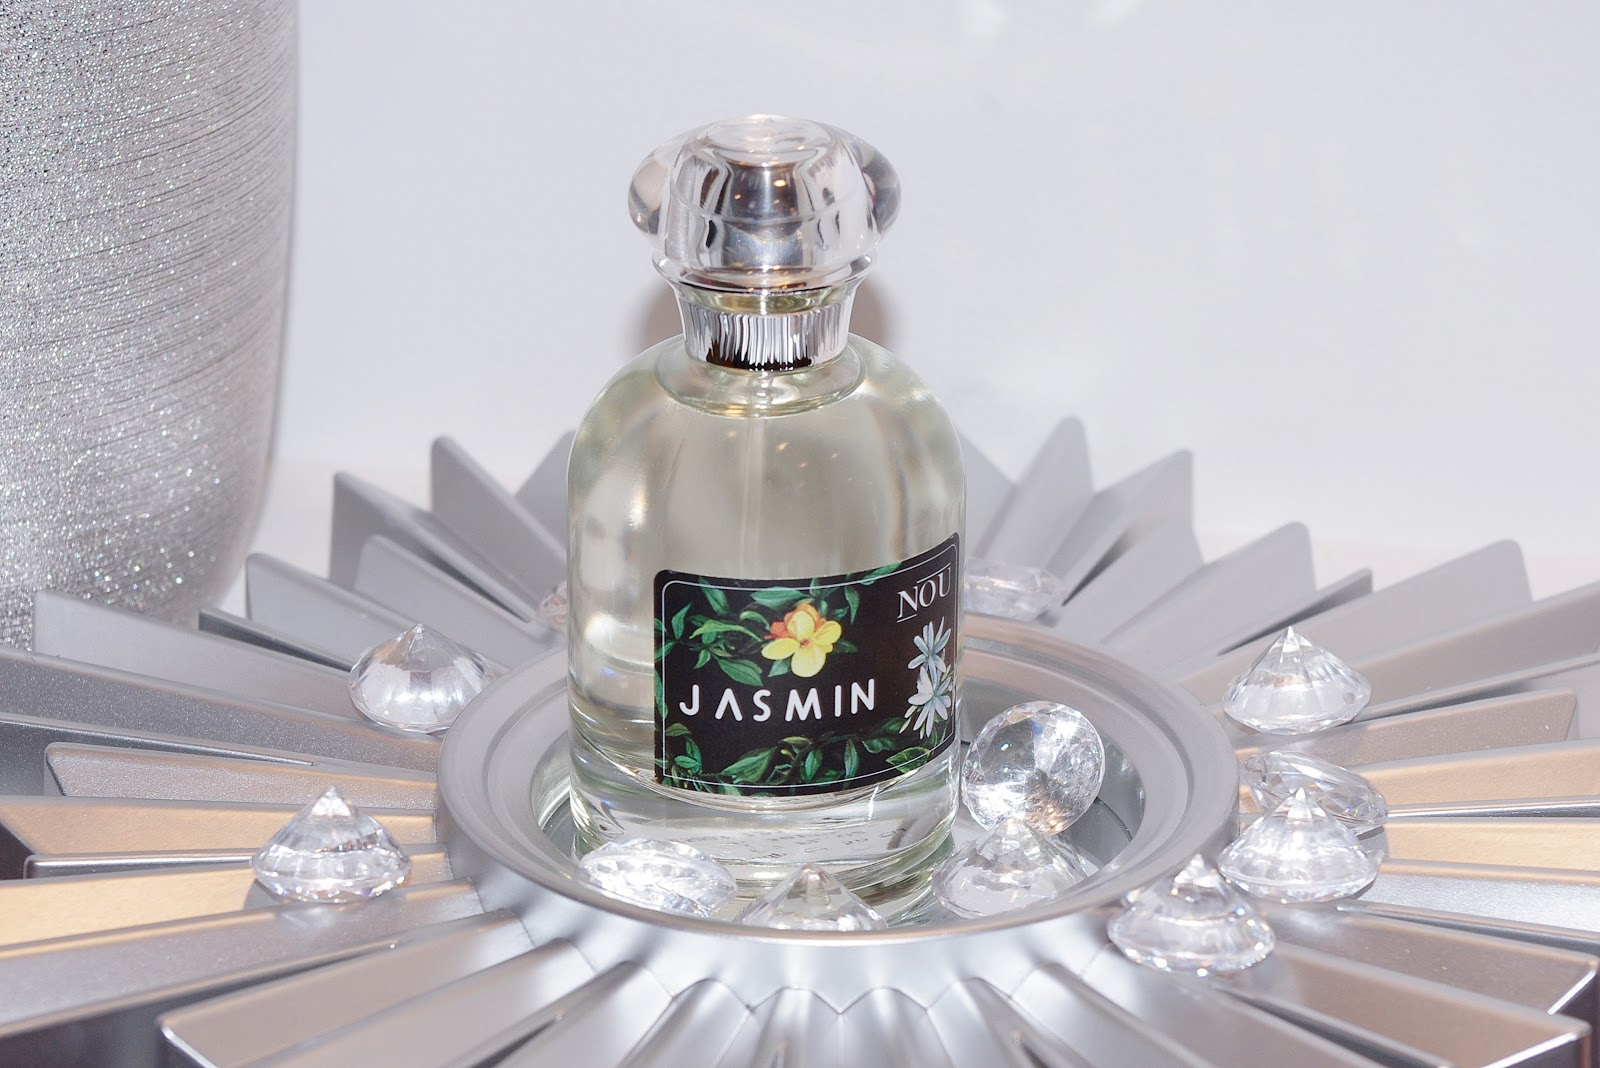 NOU Jasmin